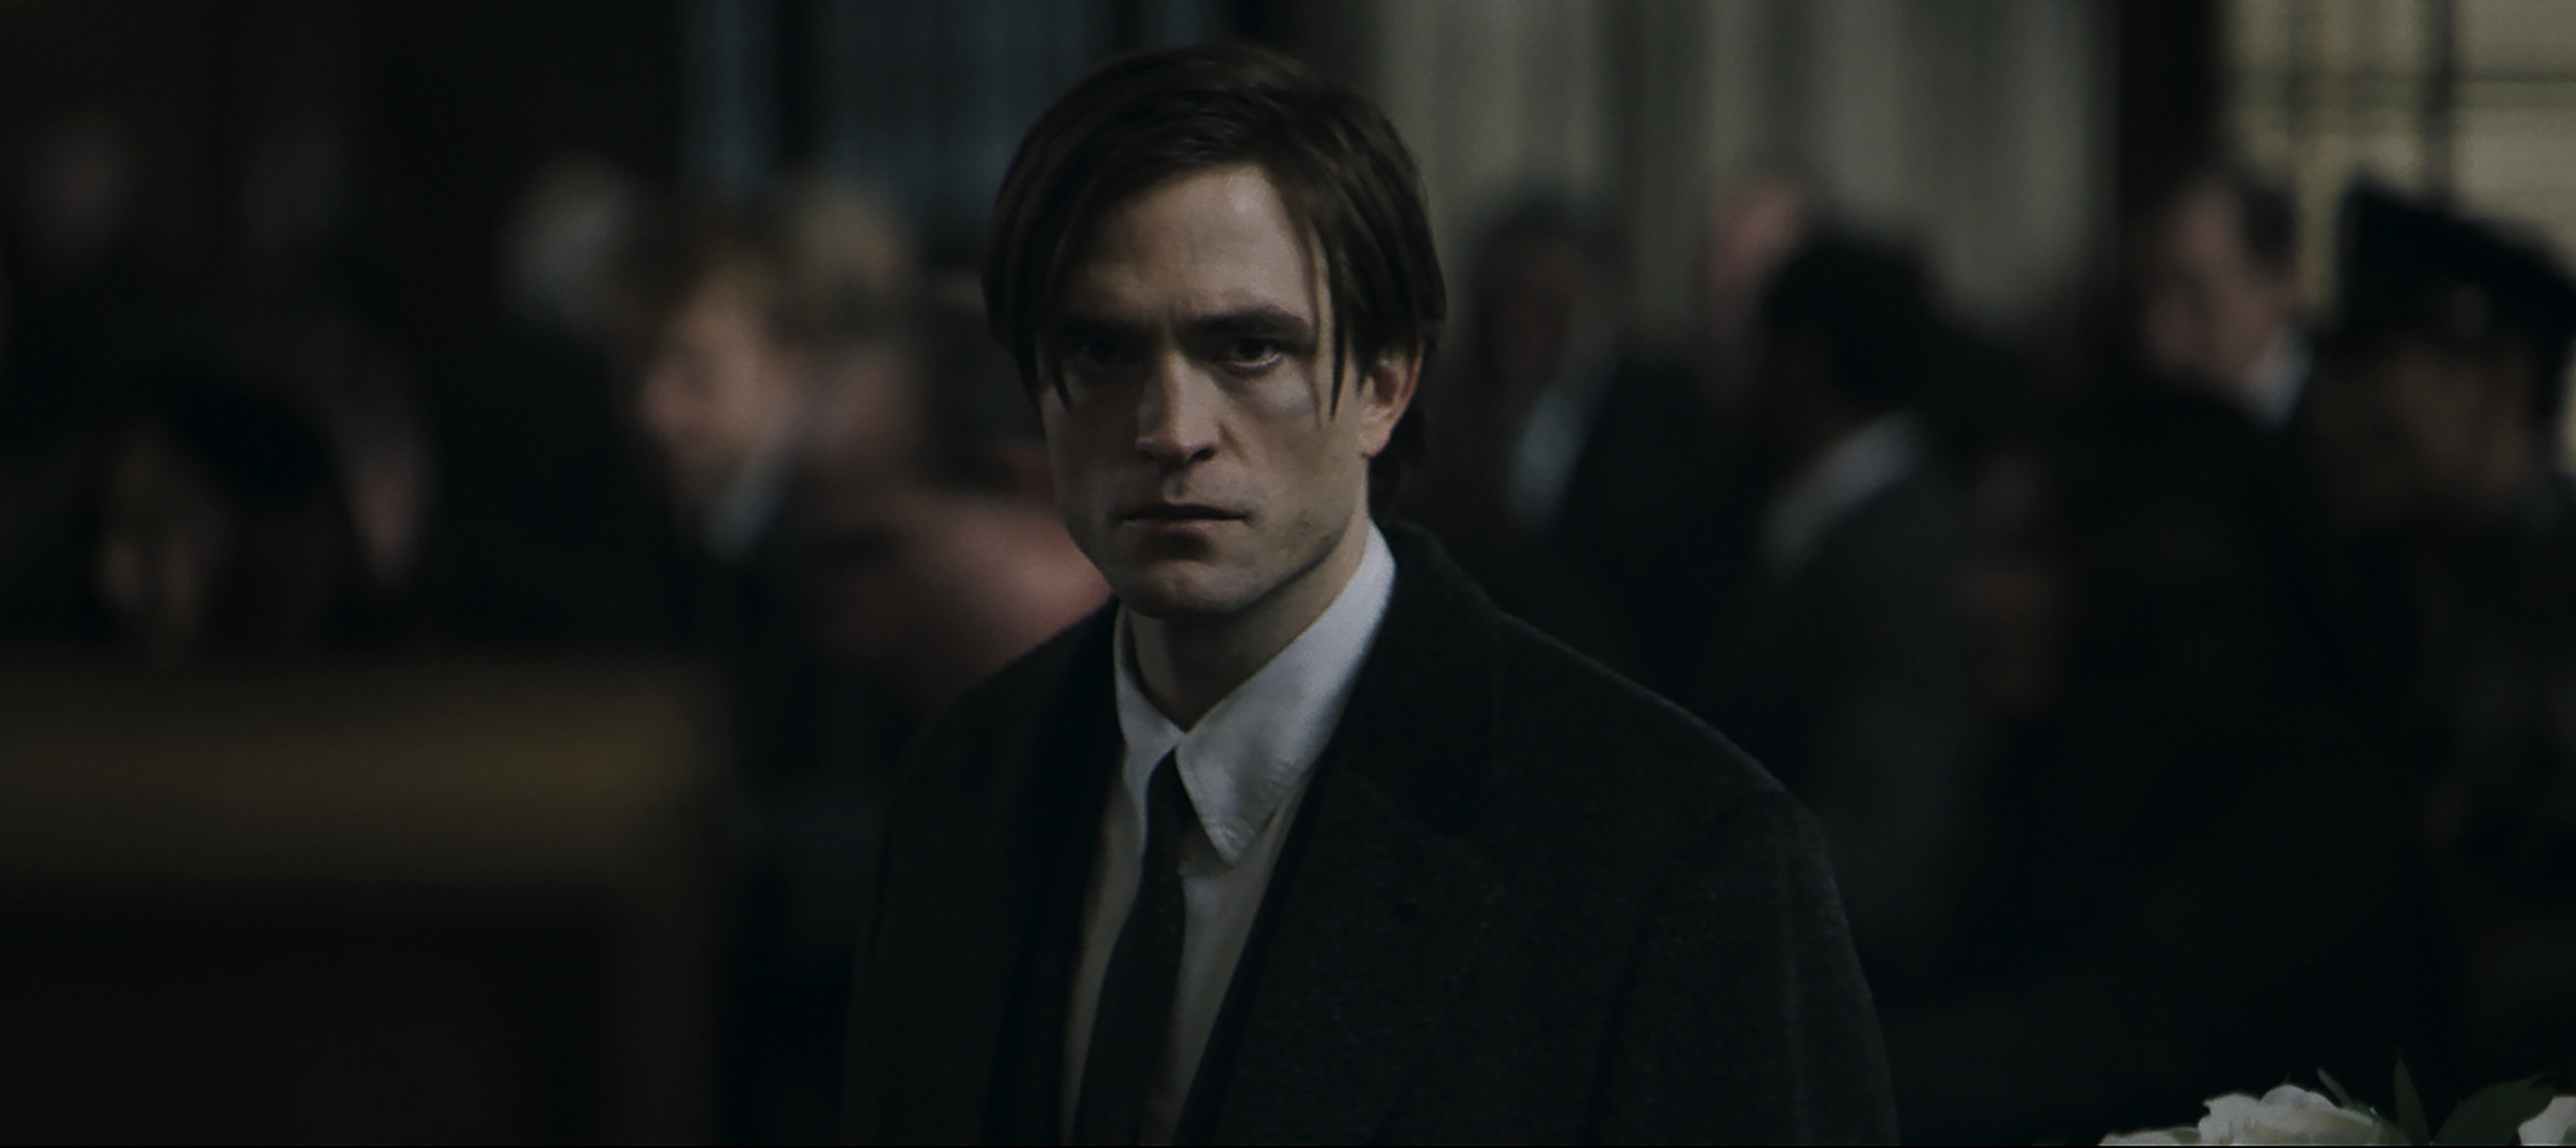 Robert Pattinson as Bruce Wayne in'The Batman,' which shut down production again following coronavirus concerns. (Photo: Warner Bros. Pictures/DC Comics)